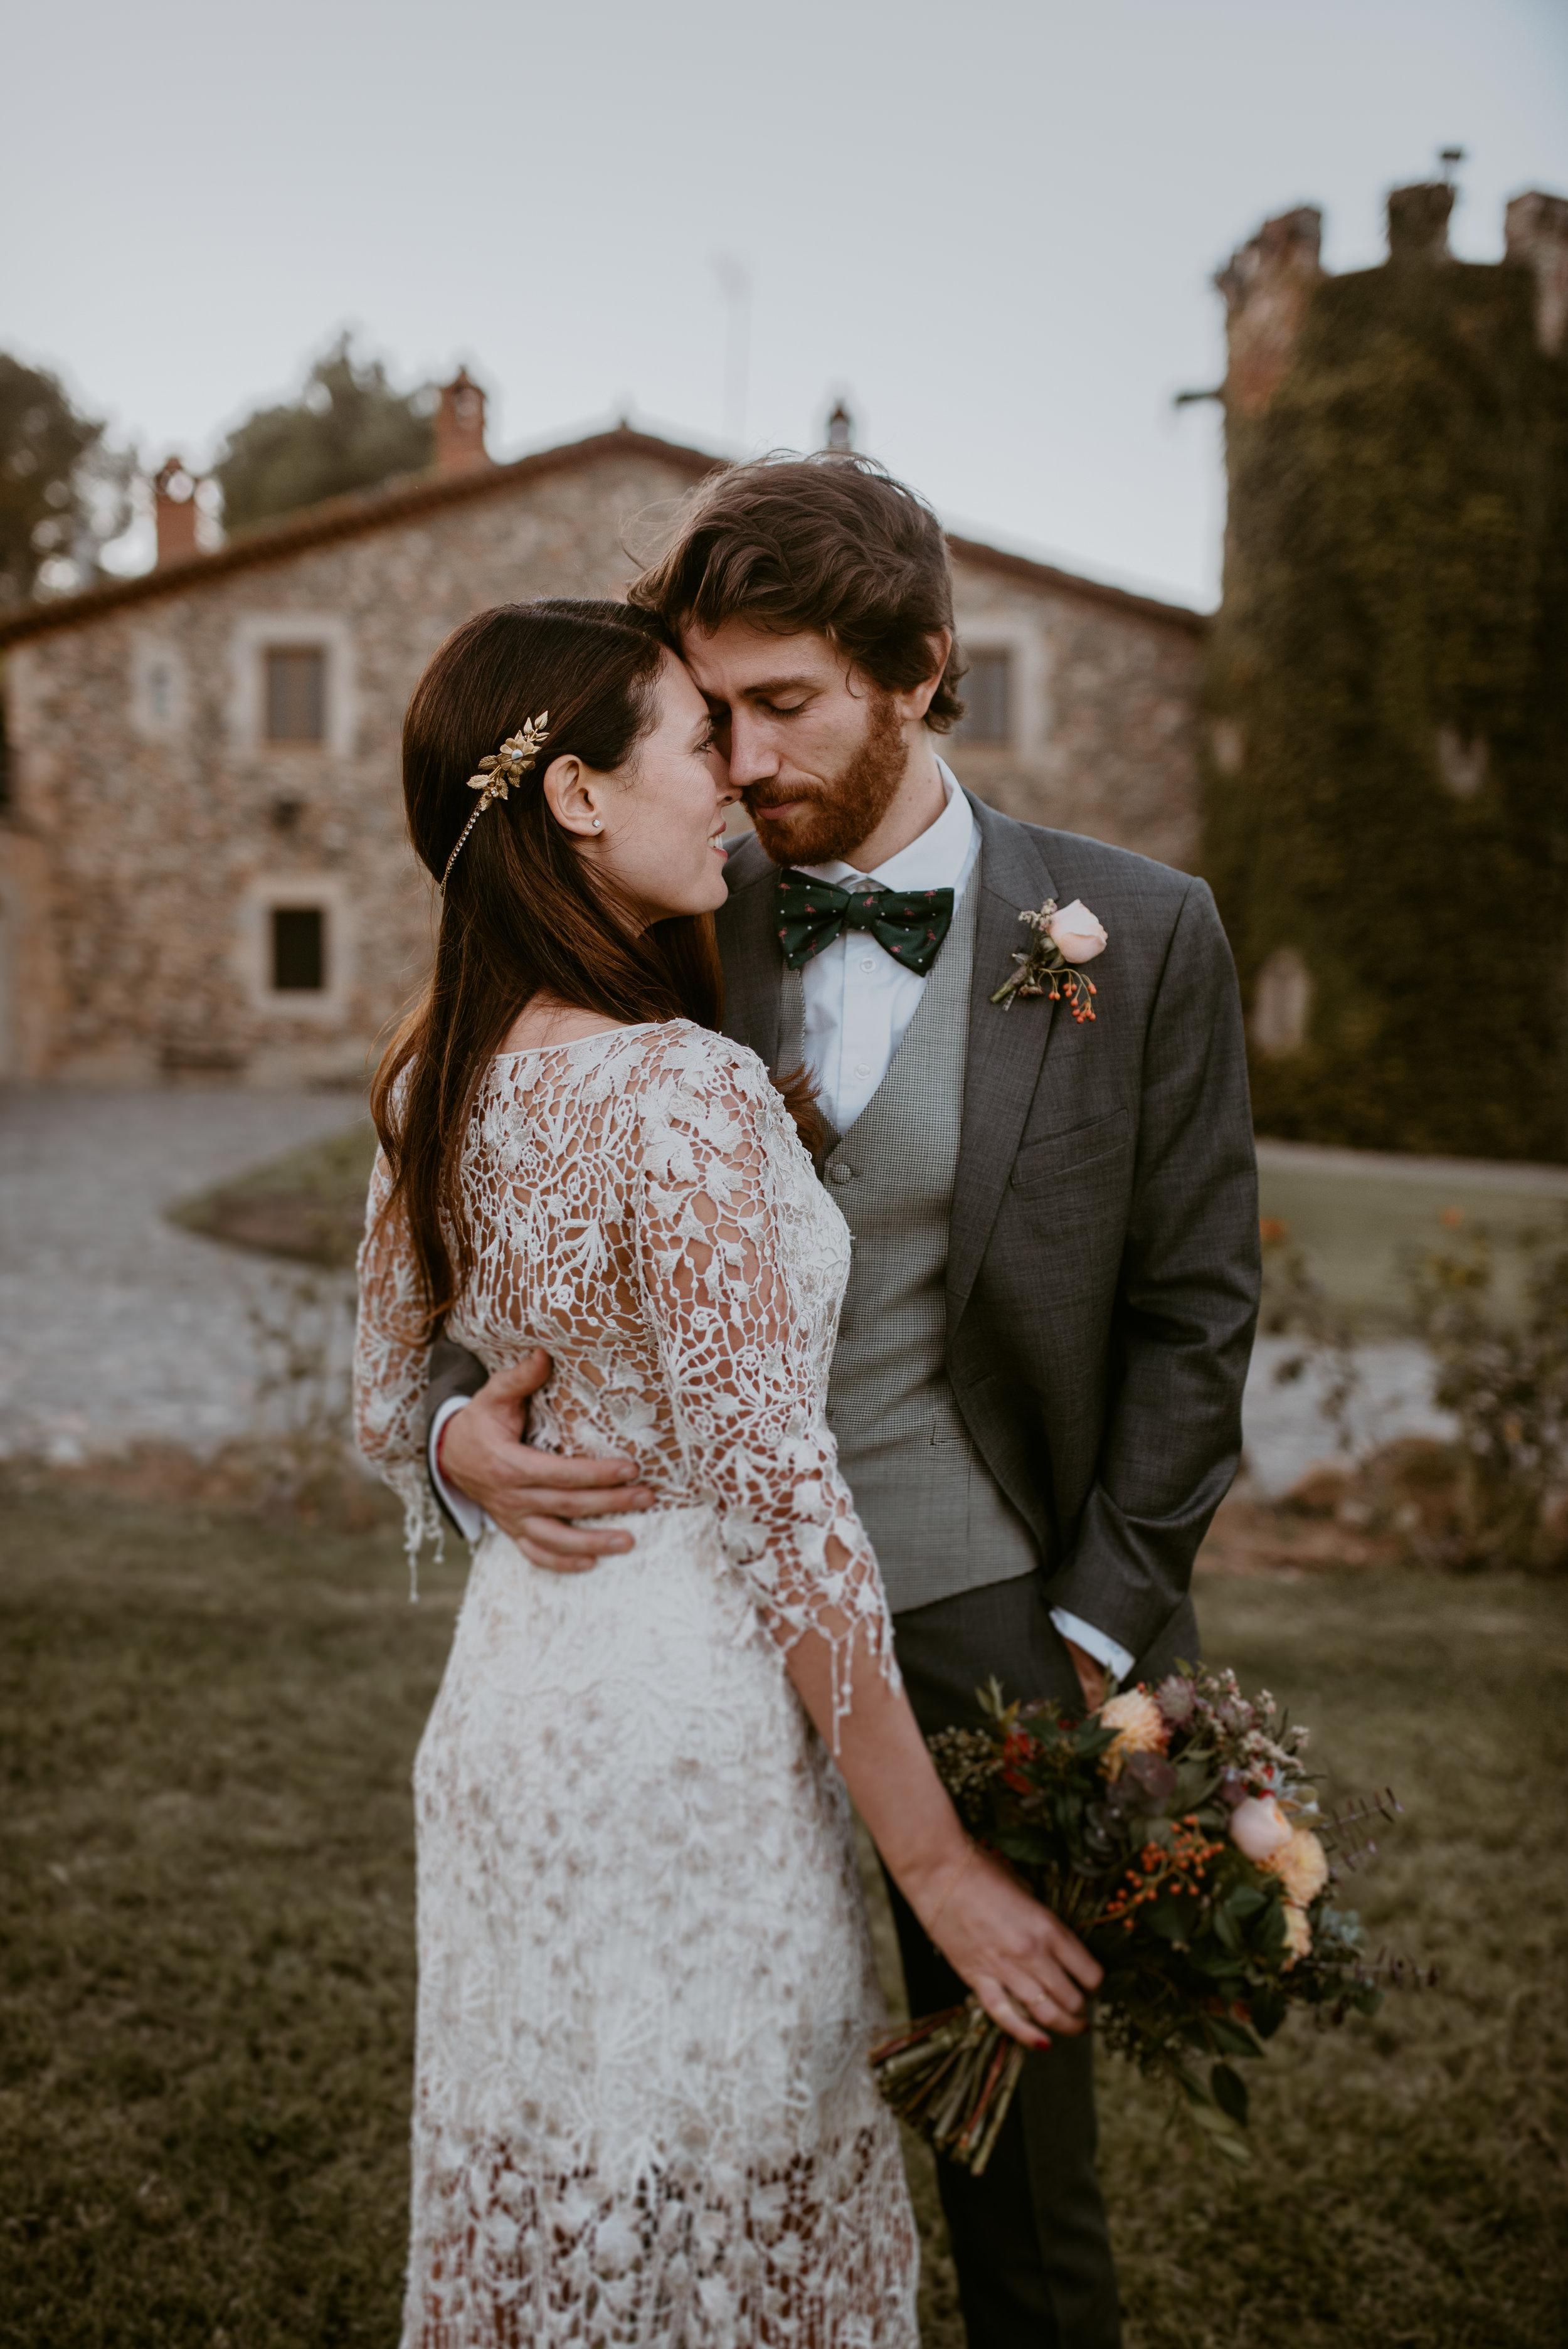 pareja de recién casados en Tarragona, Fénix visual, videógrafo de bodas,